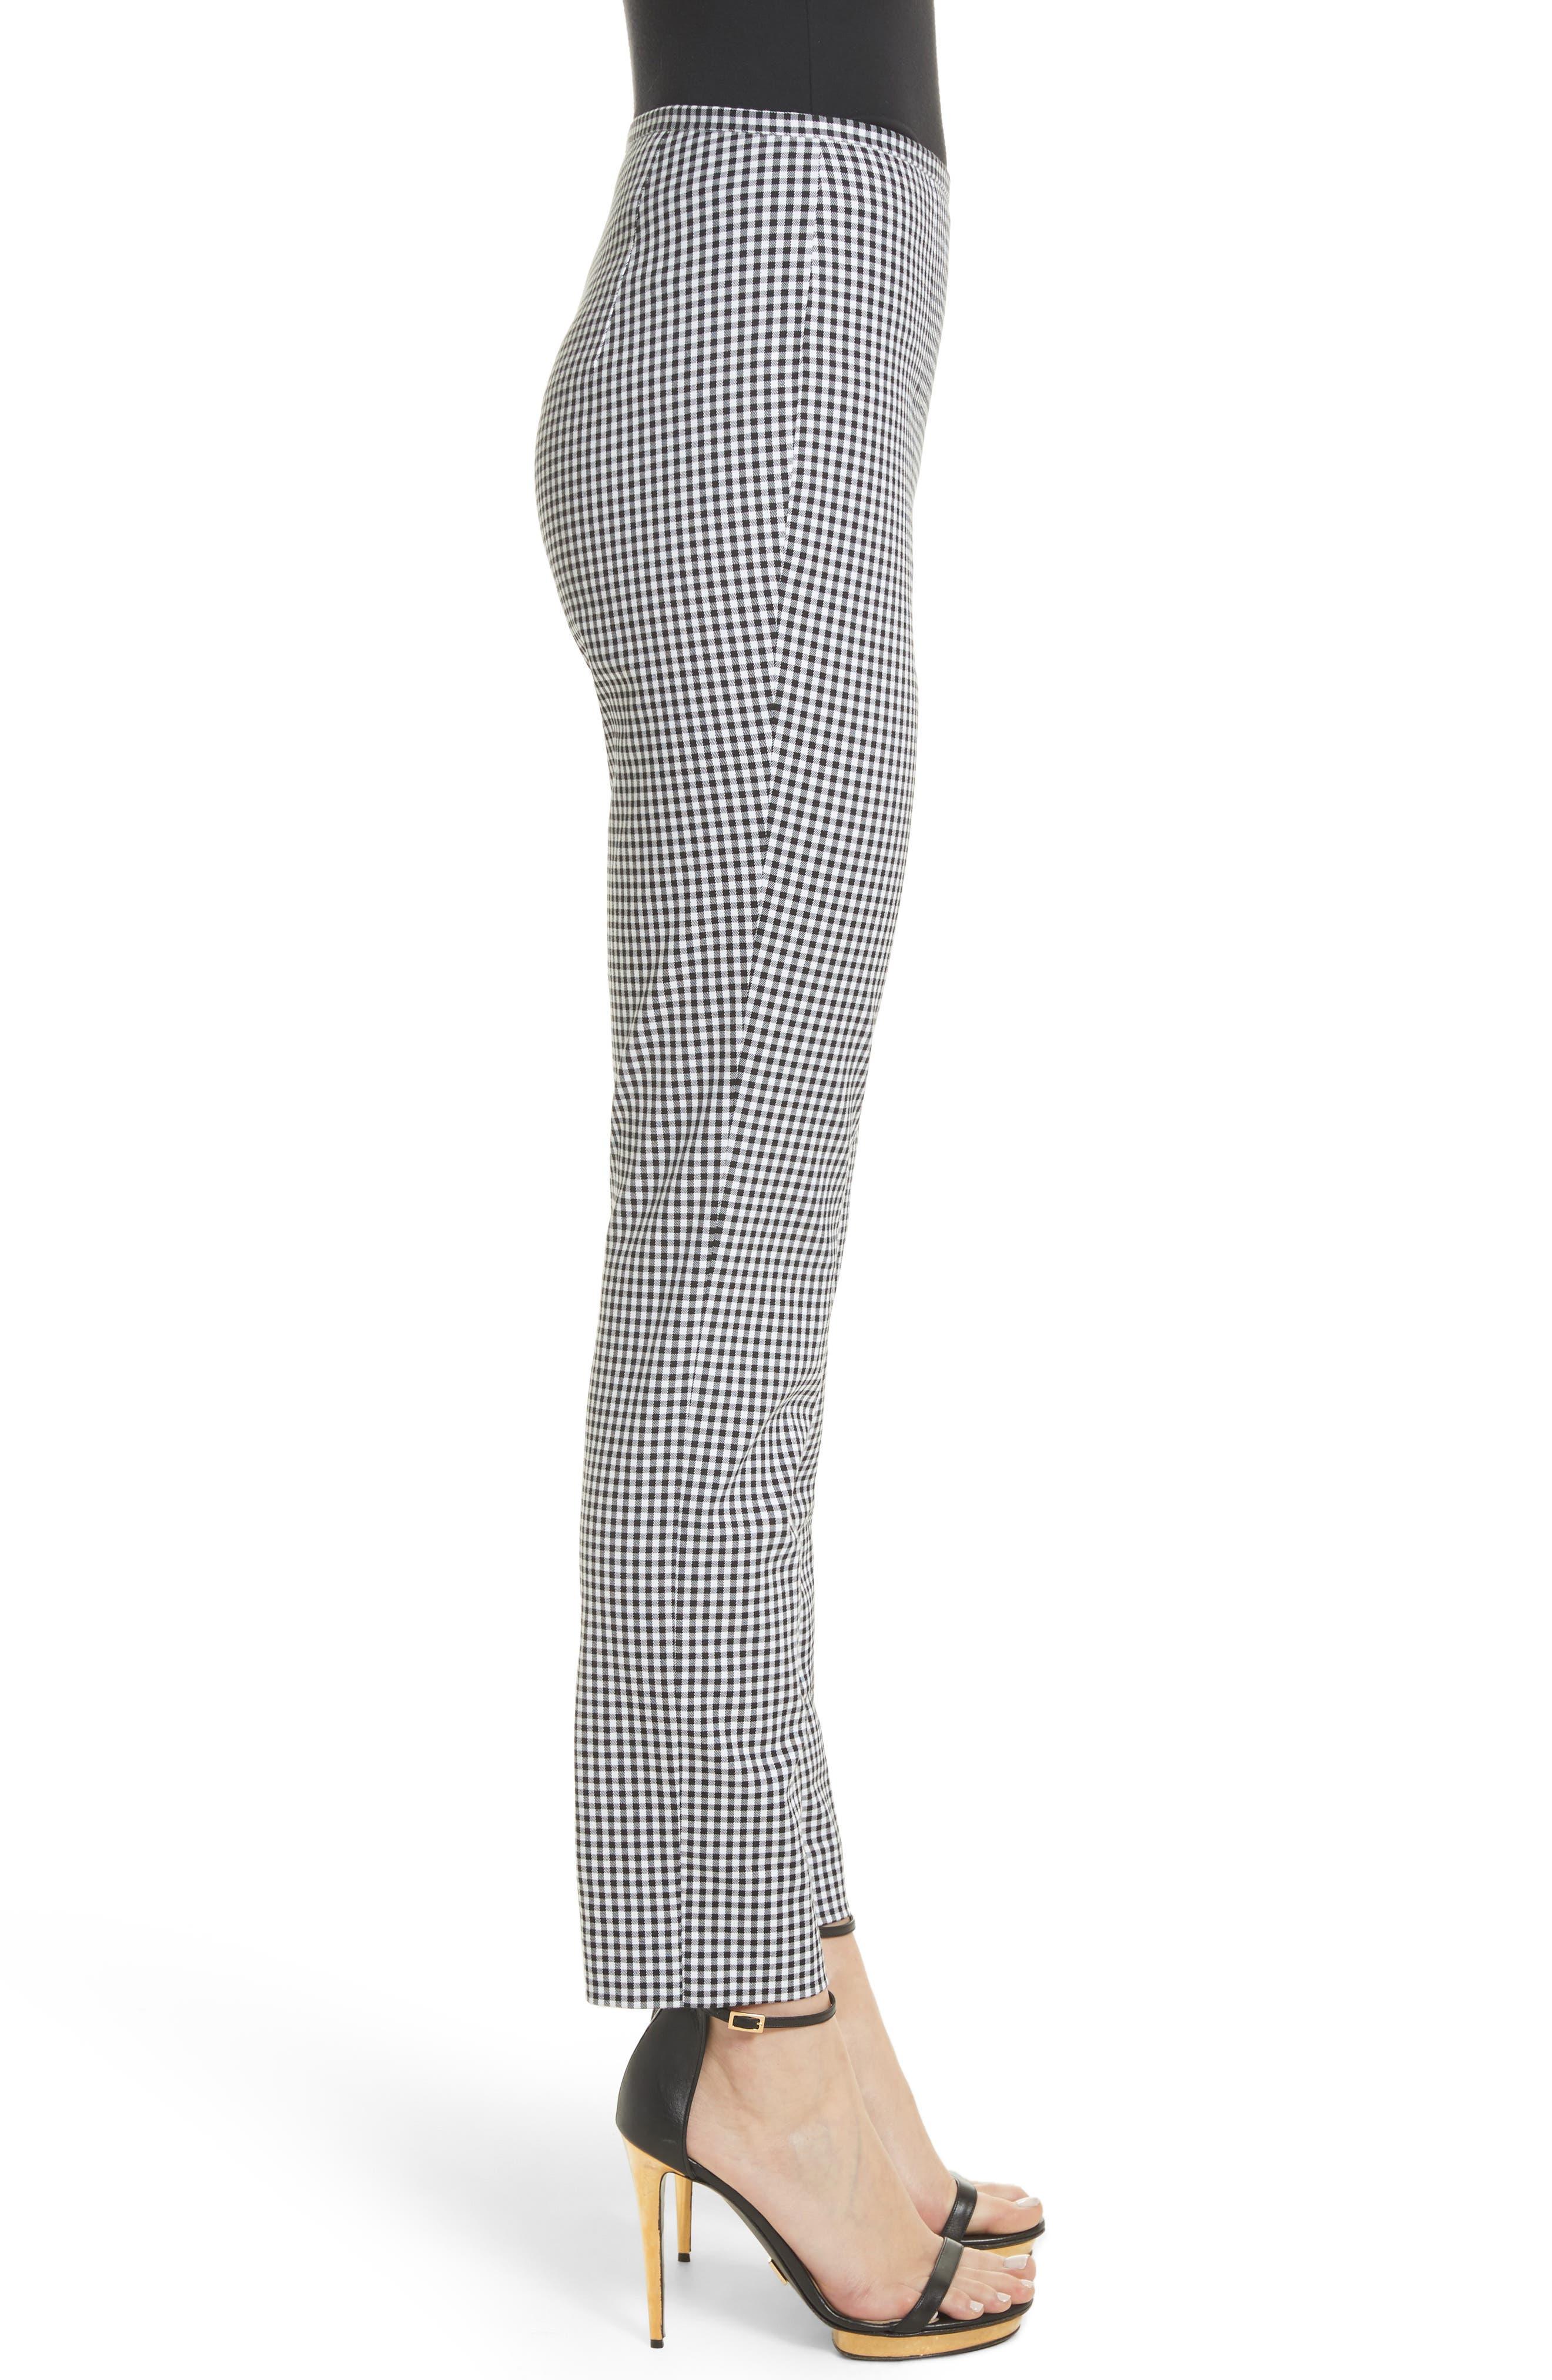 Gingham Stretch Cotton Pants,                             Alternate thumbnail 4, color,                             Black / White